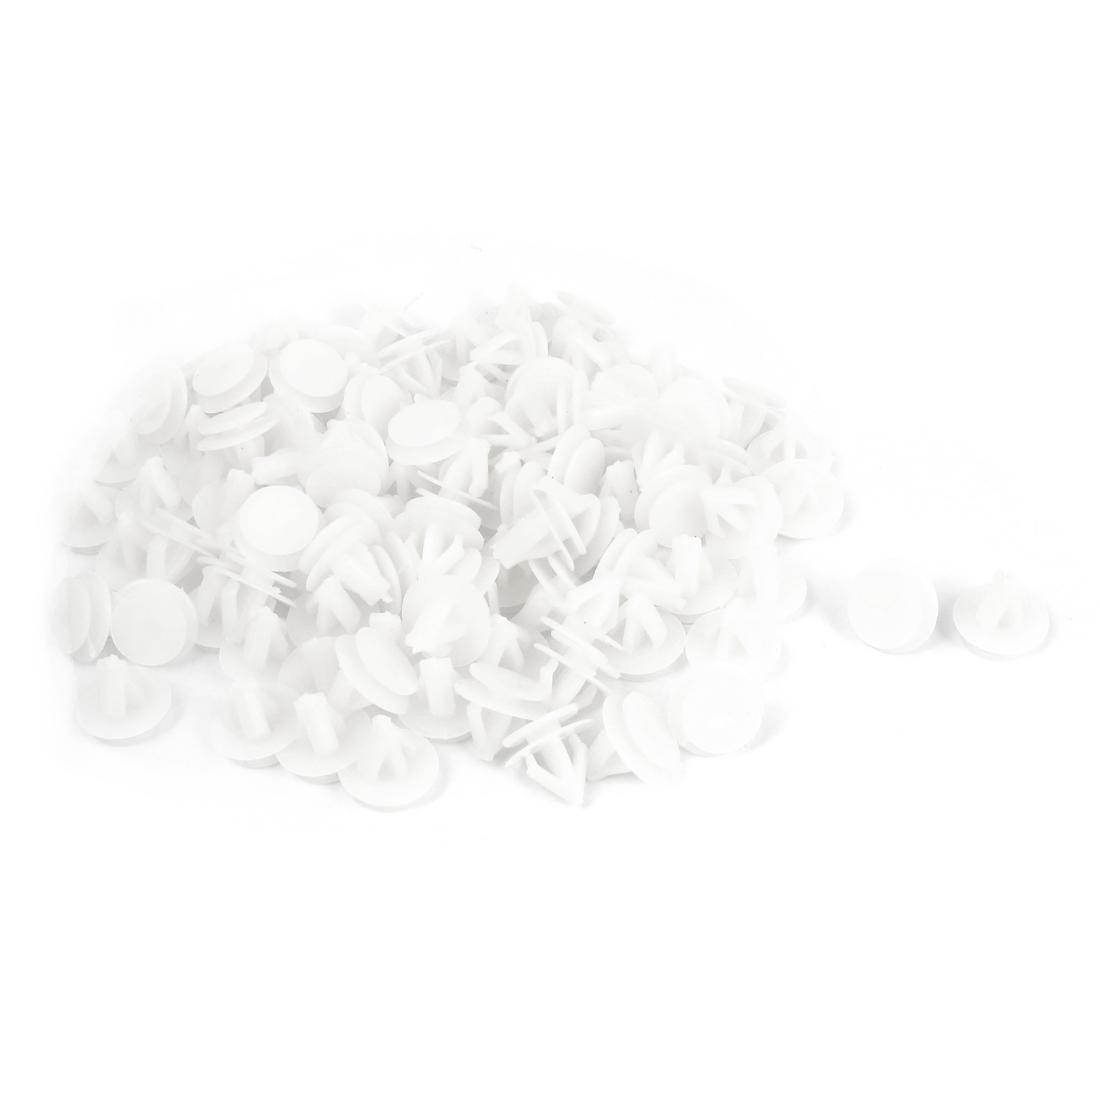 100Pcs Plastic Rivet Automobile Door Fender Trunk Clips Fastener White